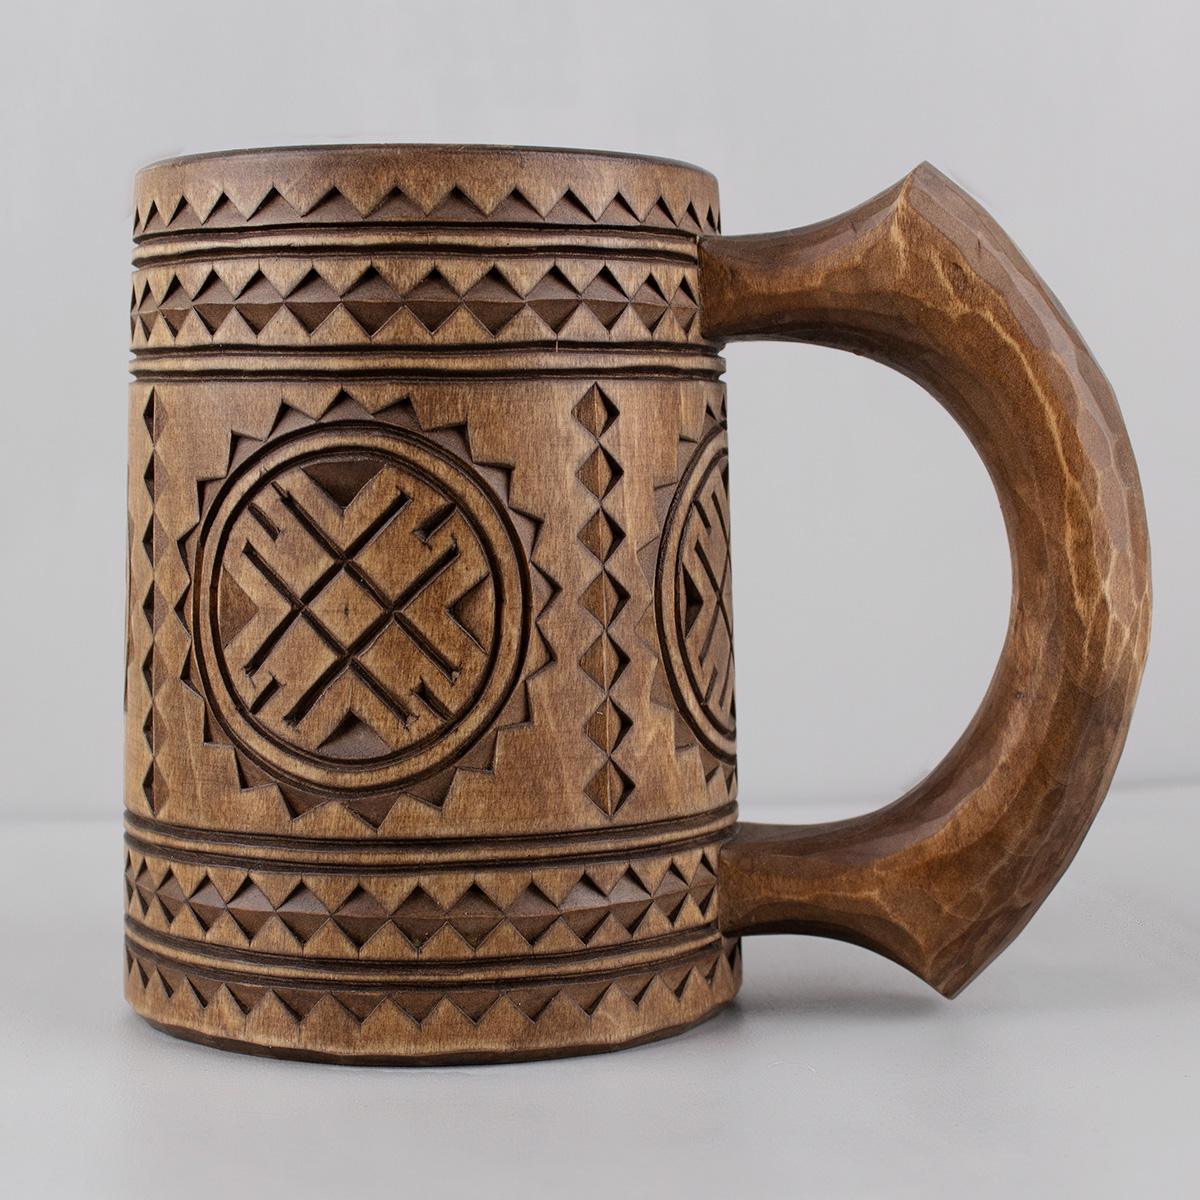 Large Turned Wooden Mug from Linden wood